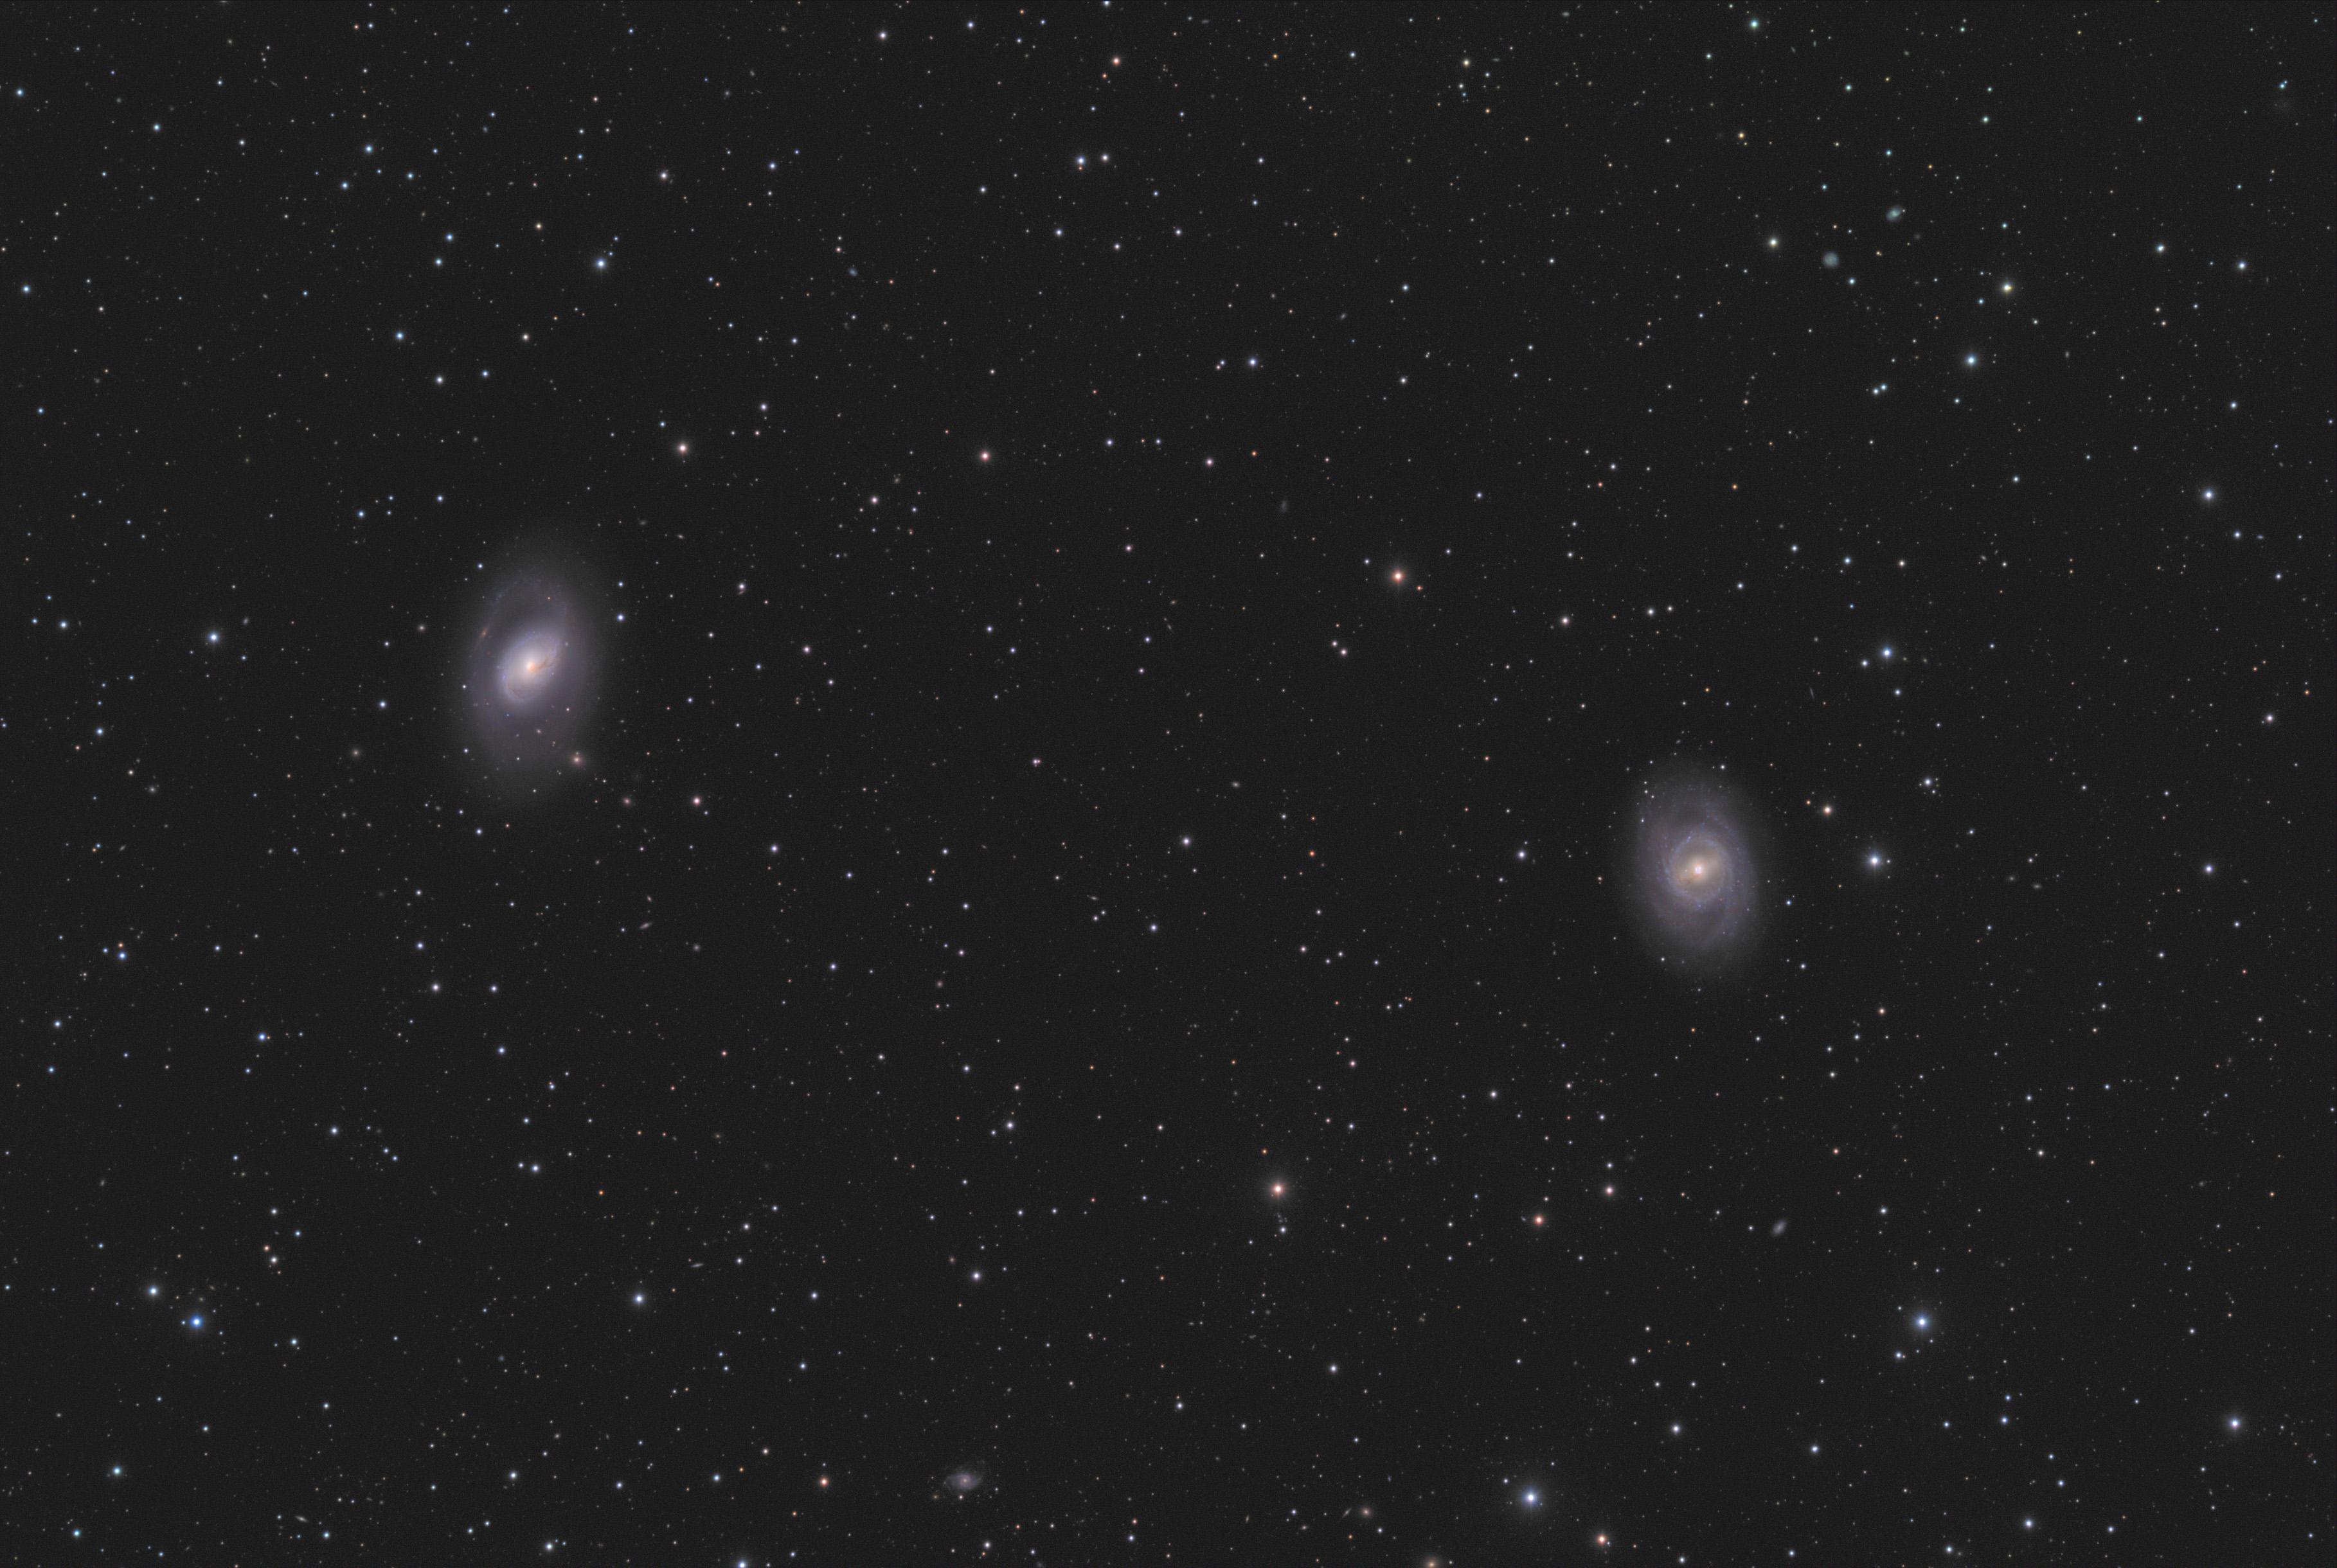 M95M96 12h - Астрофото: M95 + M96.